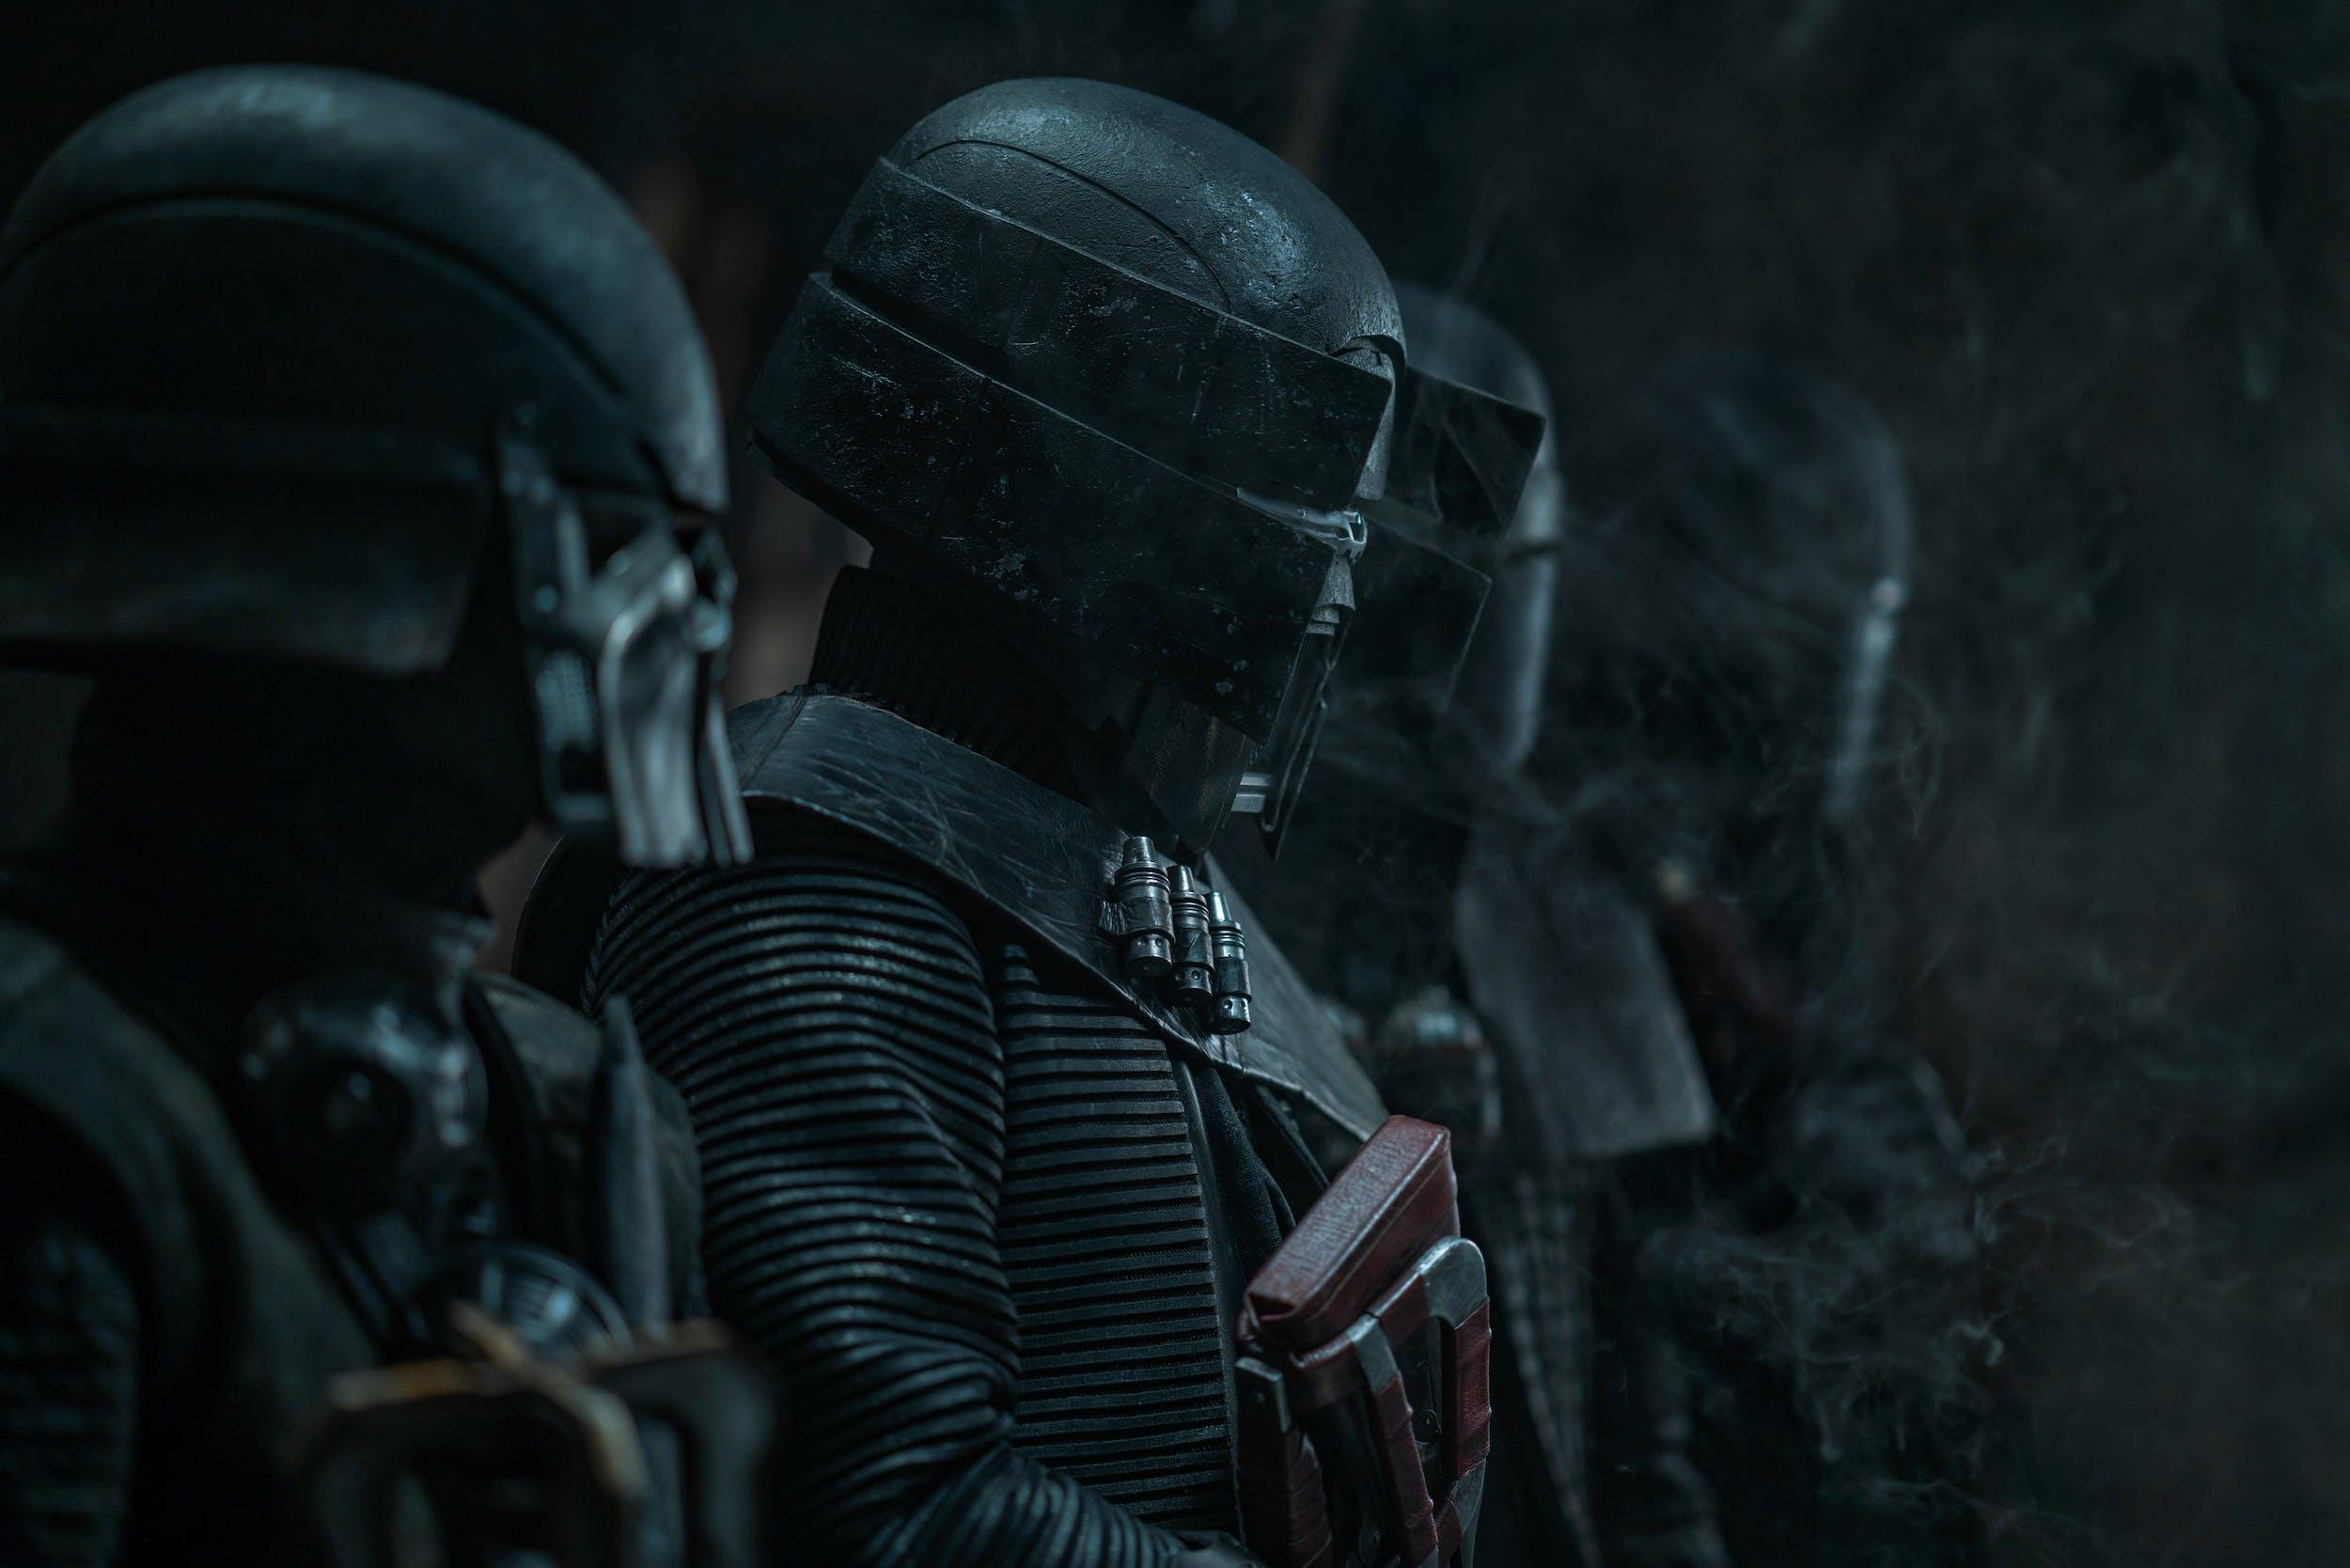 star wars rise of skywalker knights of ren